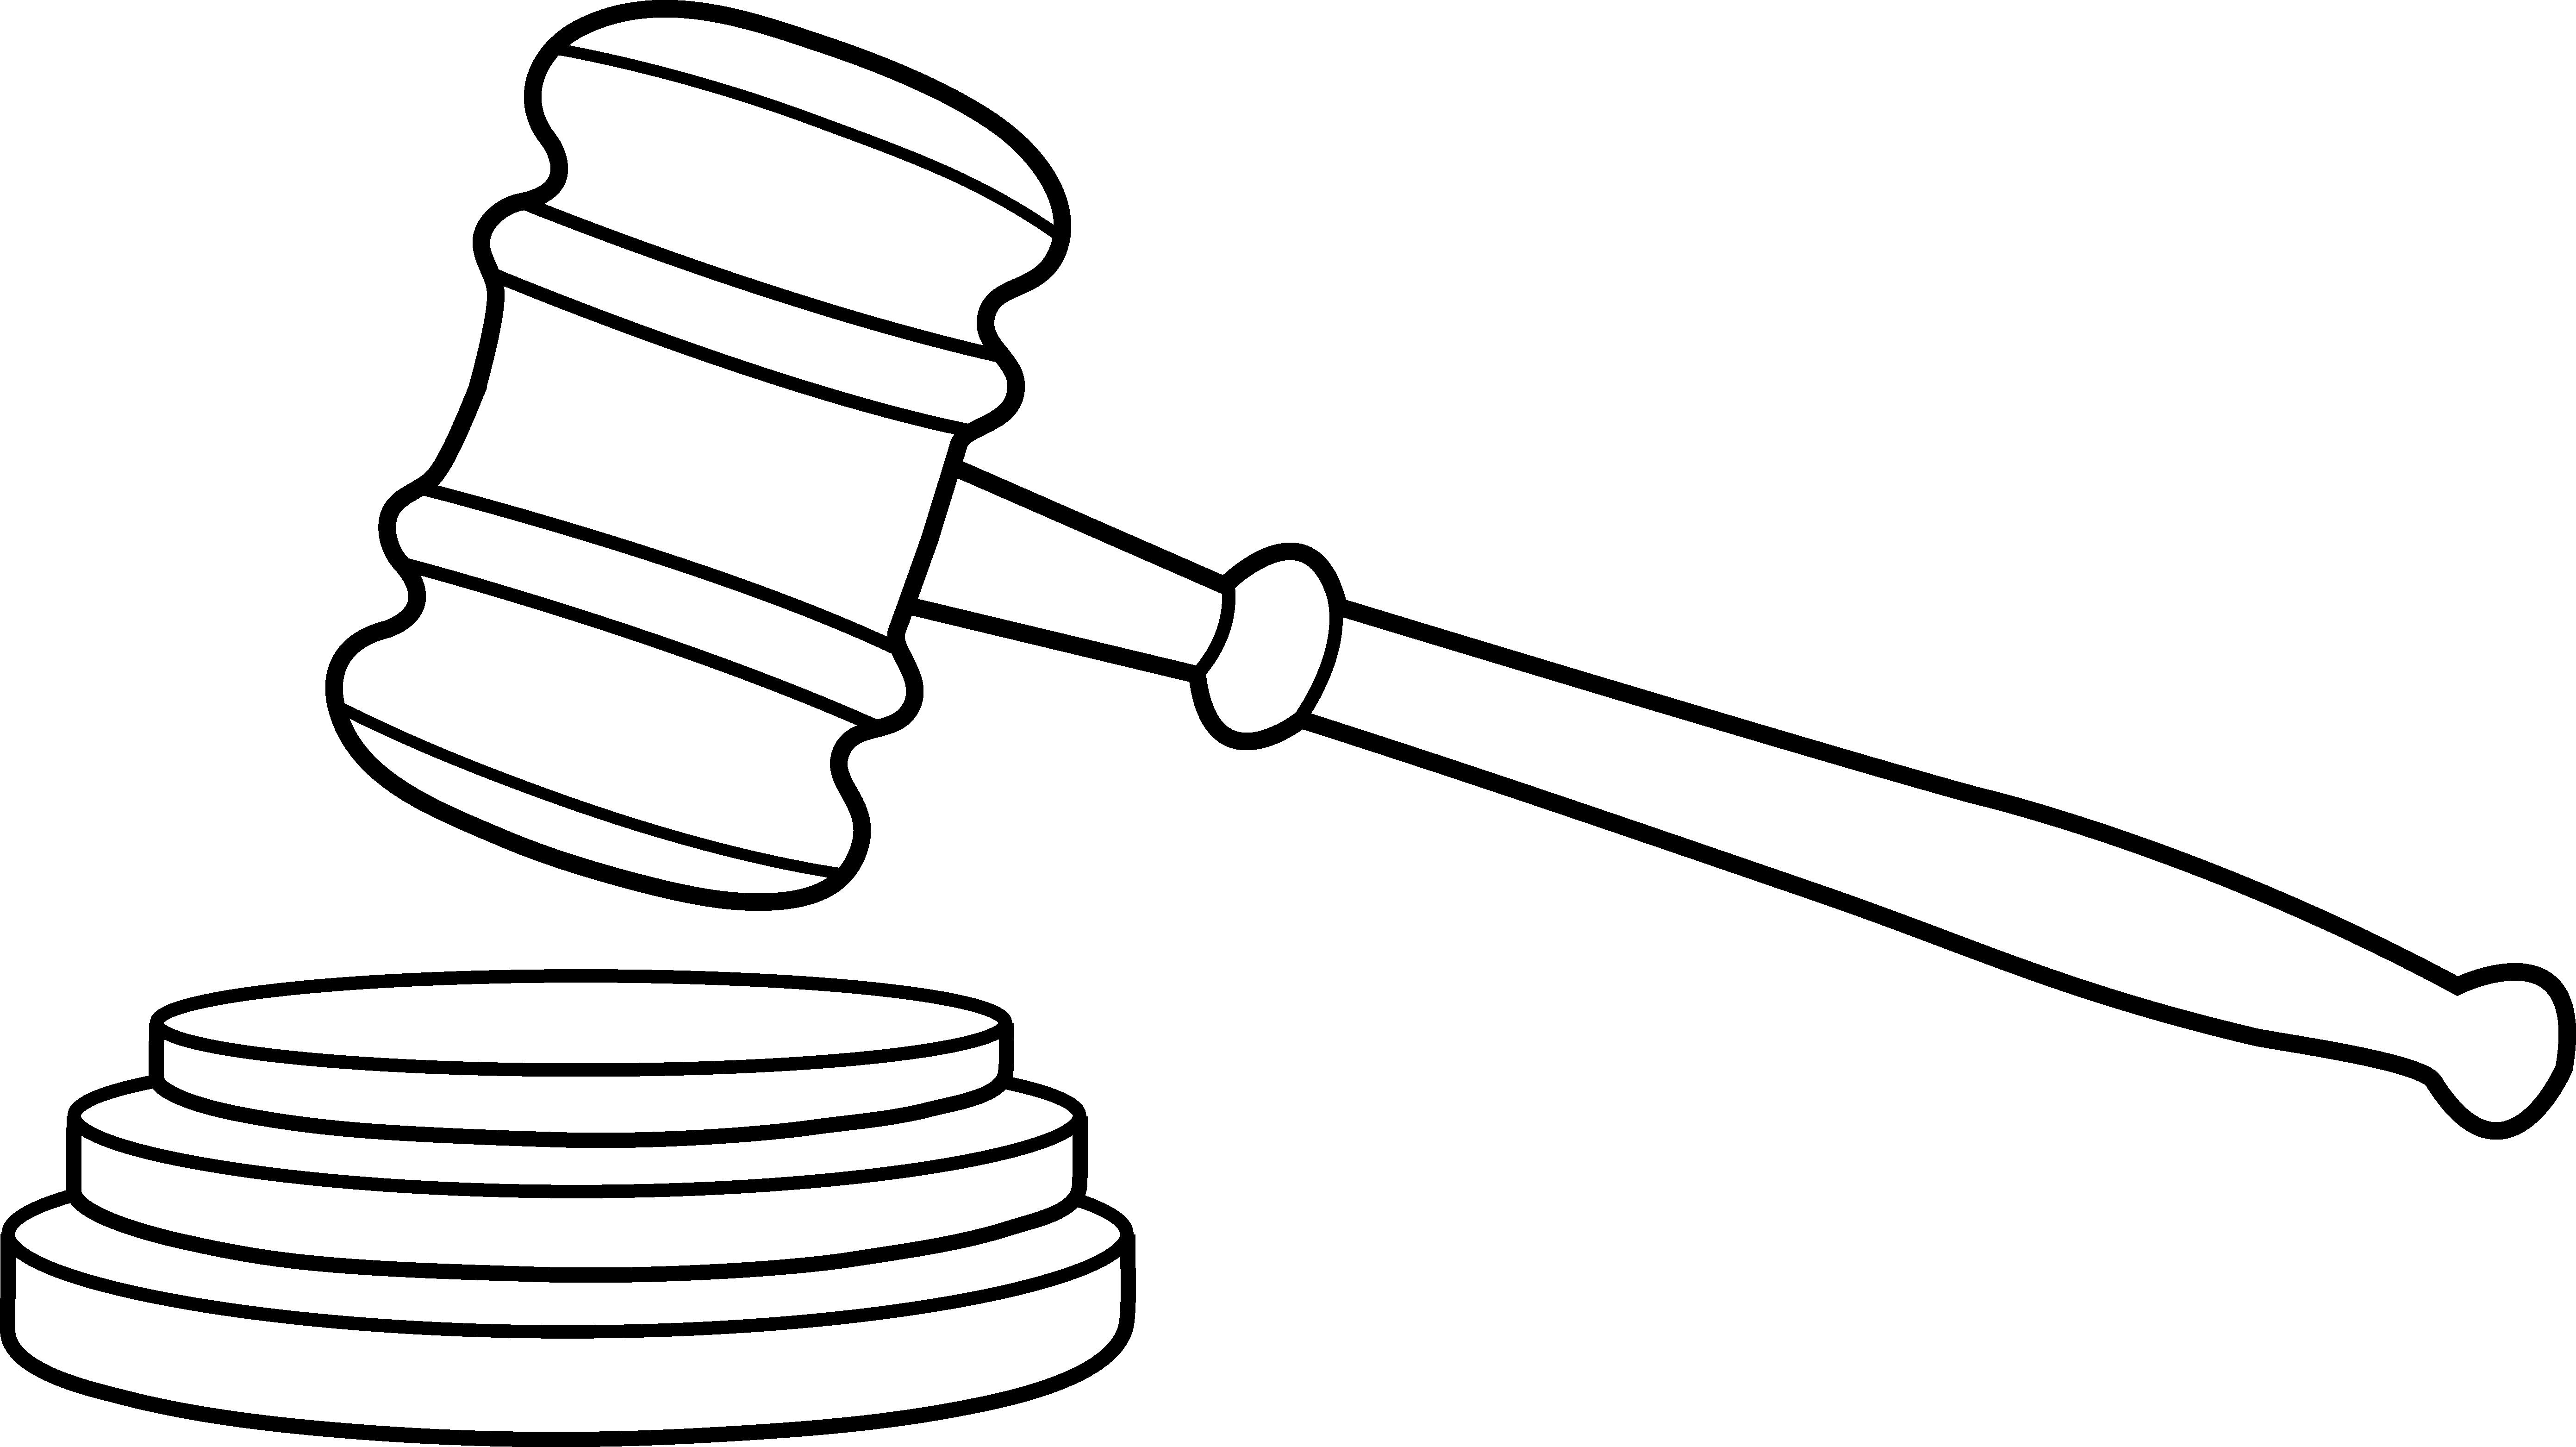 Clip Art Judge Gavel